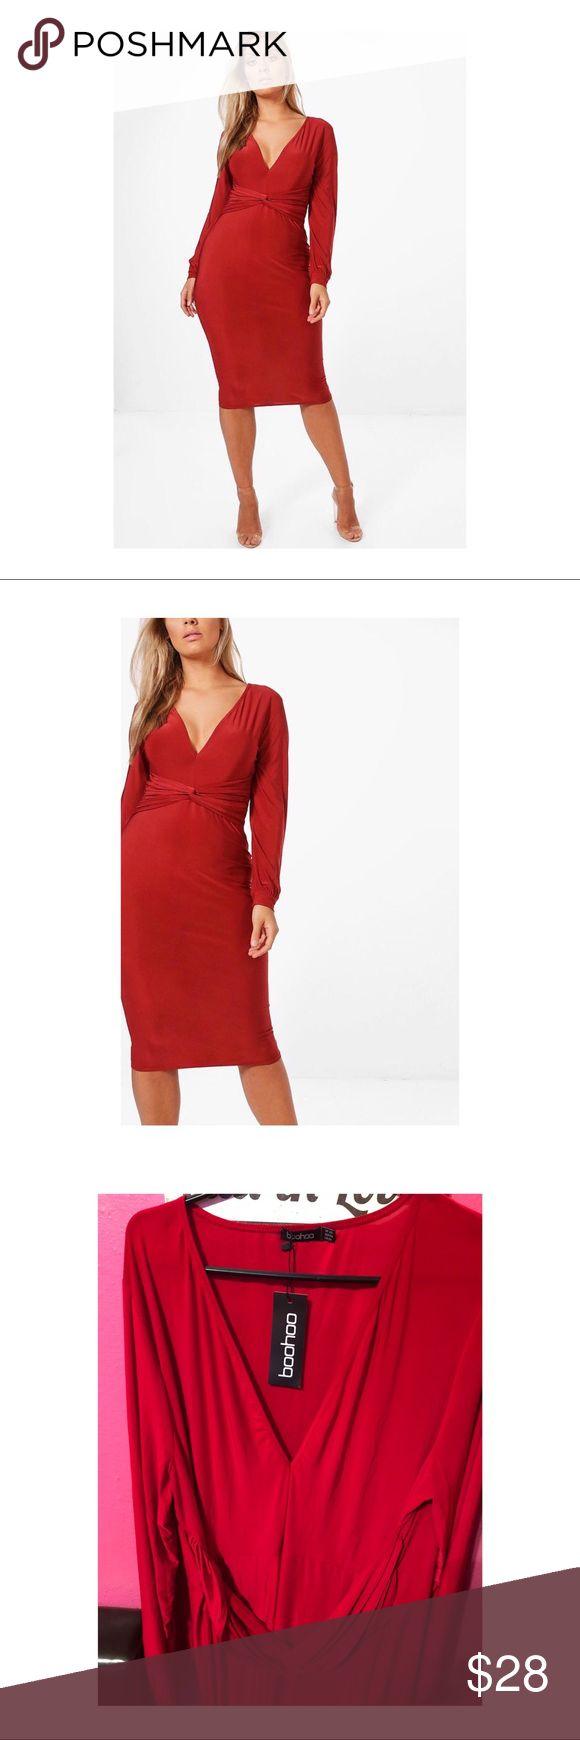 Plus Size Midi Dress NWT. Red long sleeve knot front midi dress. Size 20 never worn. Boohoo Plus Dresses Midi